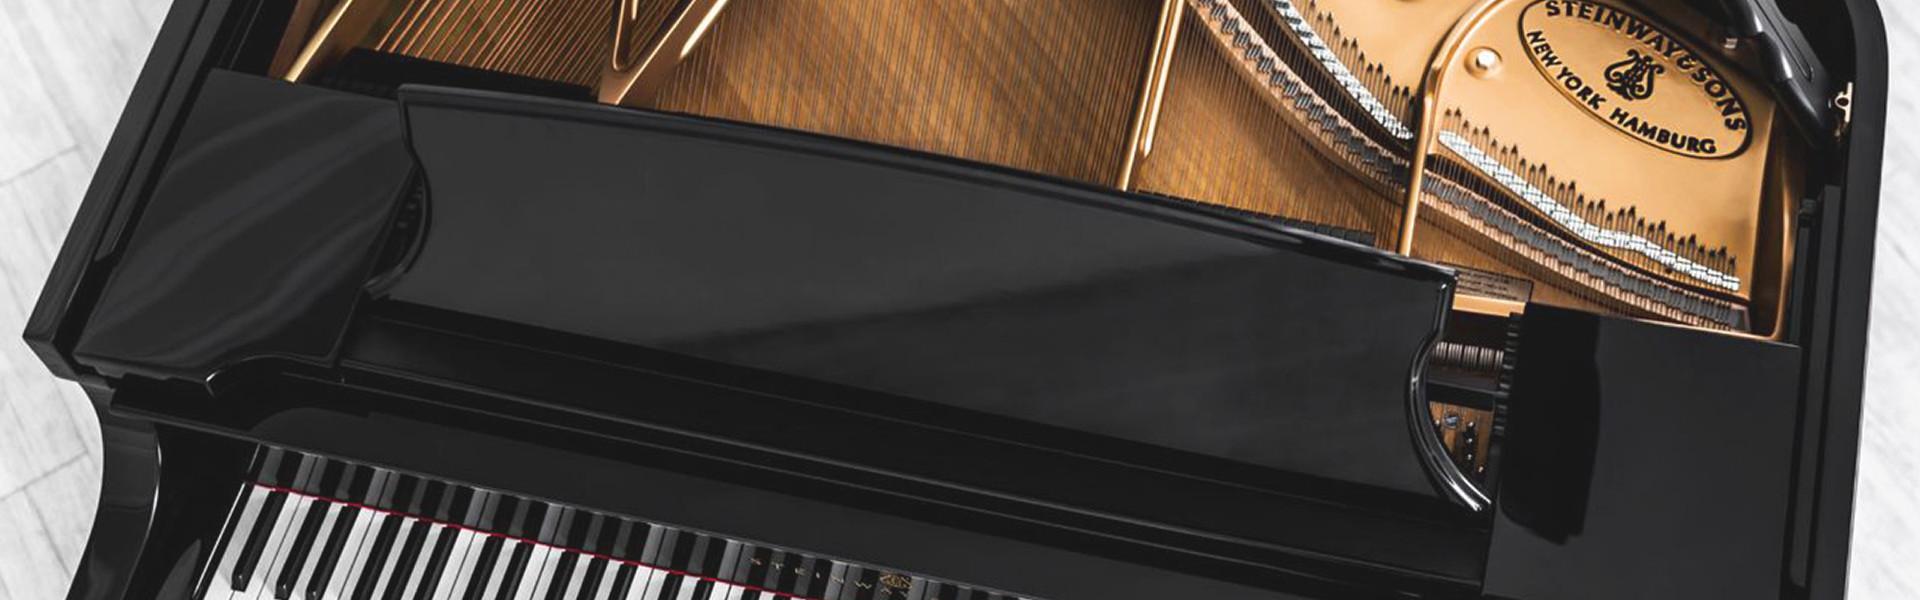 portland-piano-repair-and-restoration-from-michelles-piano-in-portland-oregon-repair-pic1